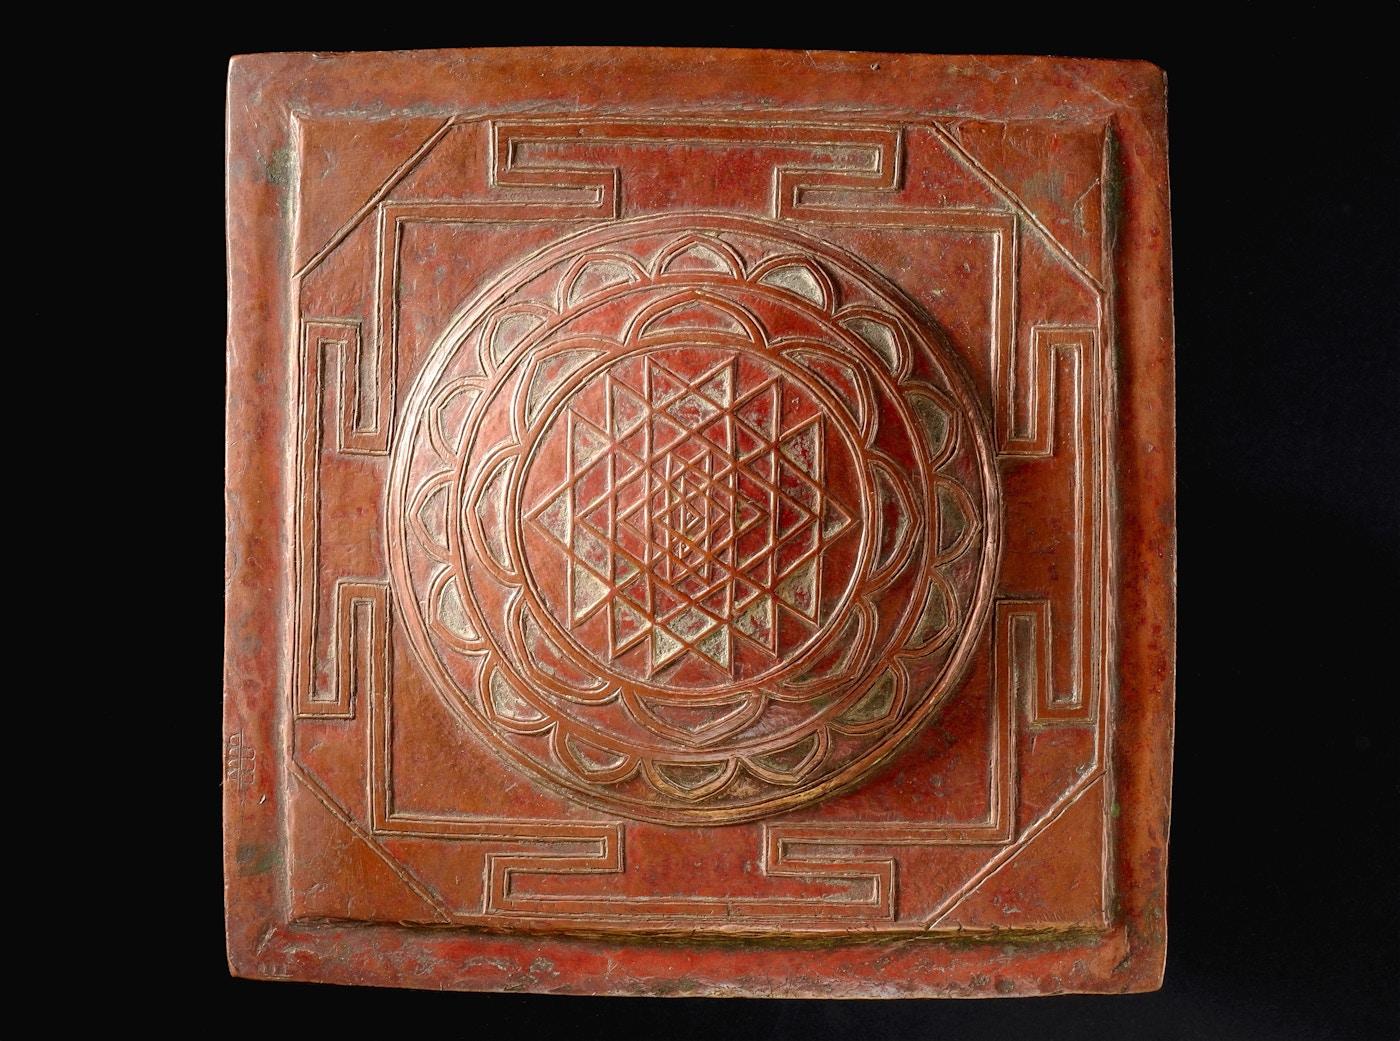 L0058515 Copper yantra meditation plaque, India, 1801-1900